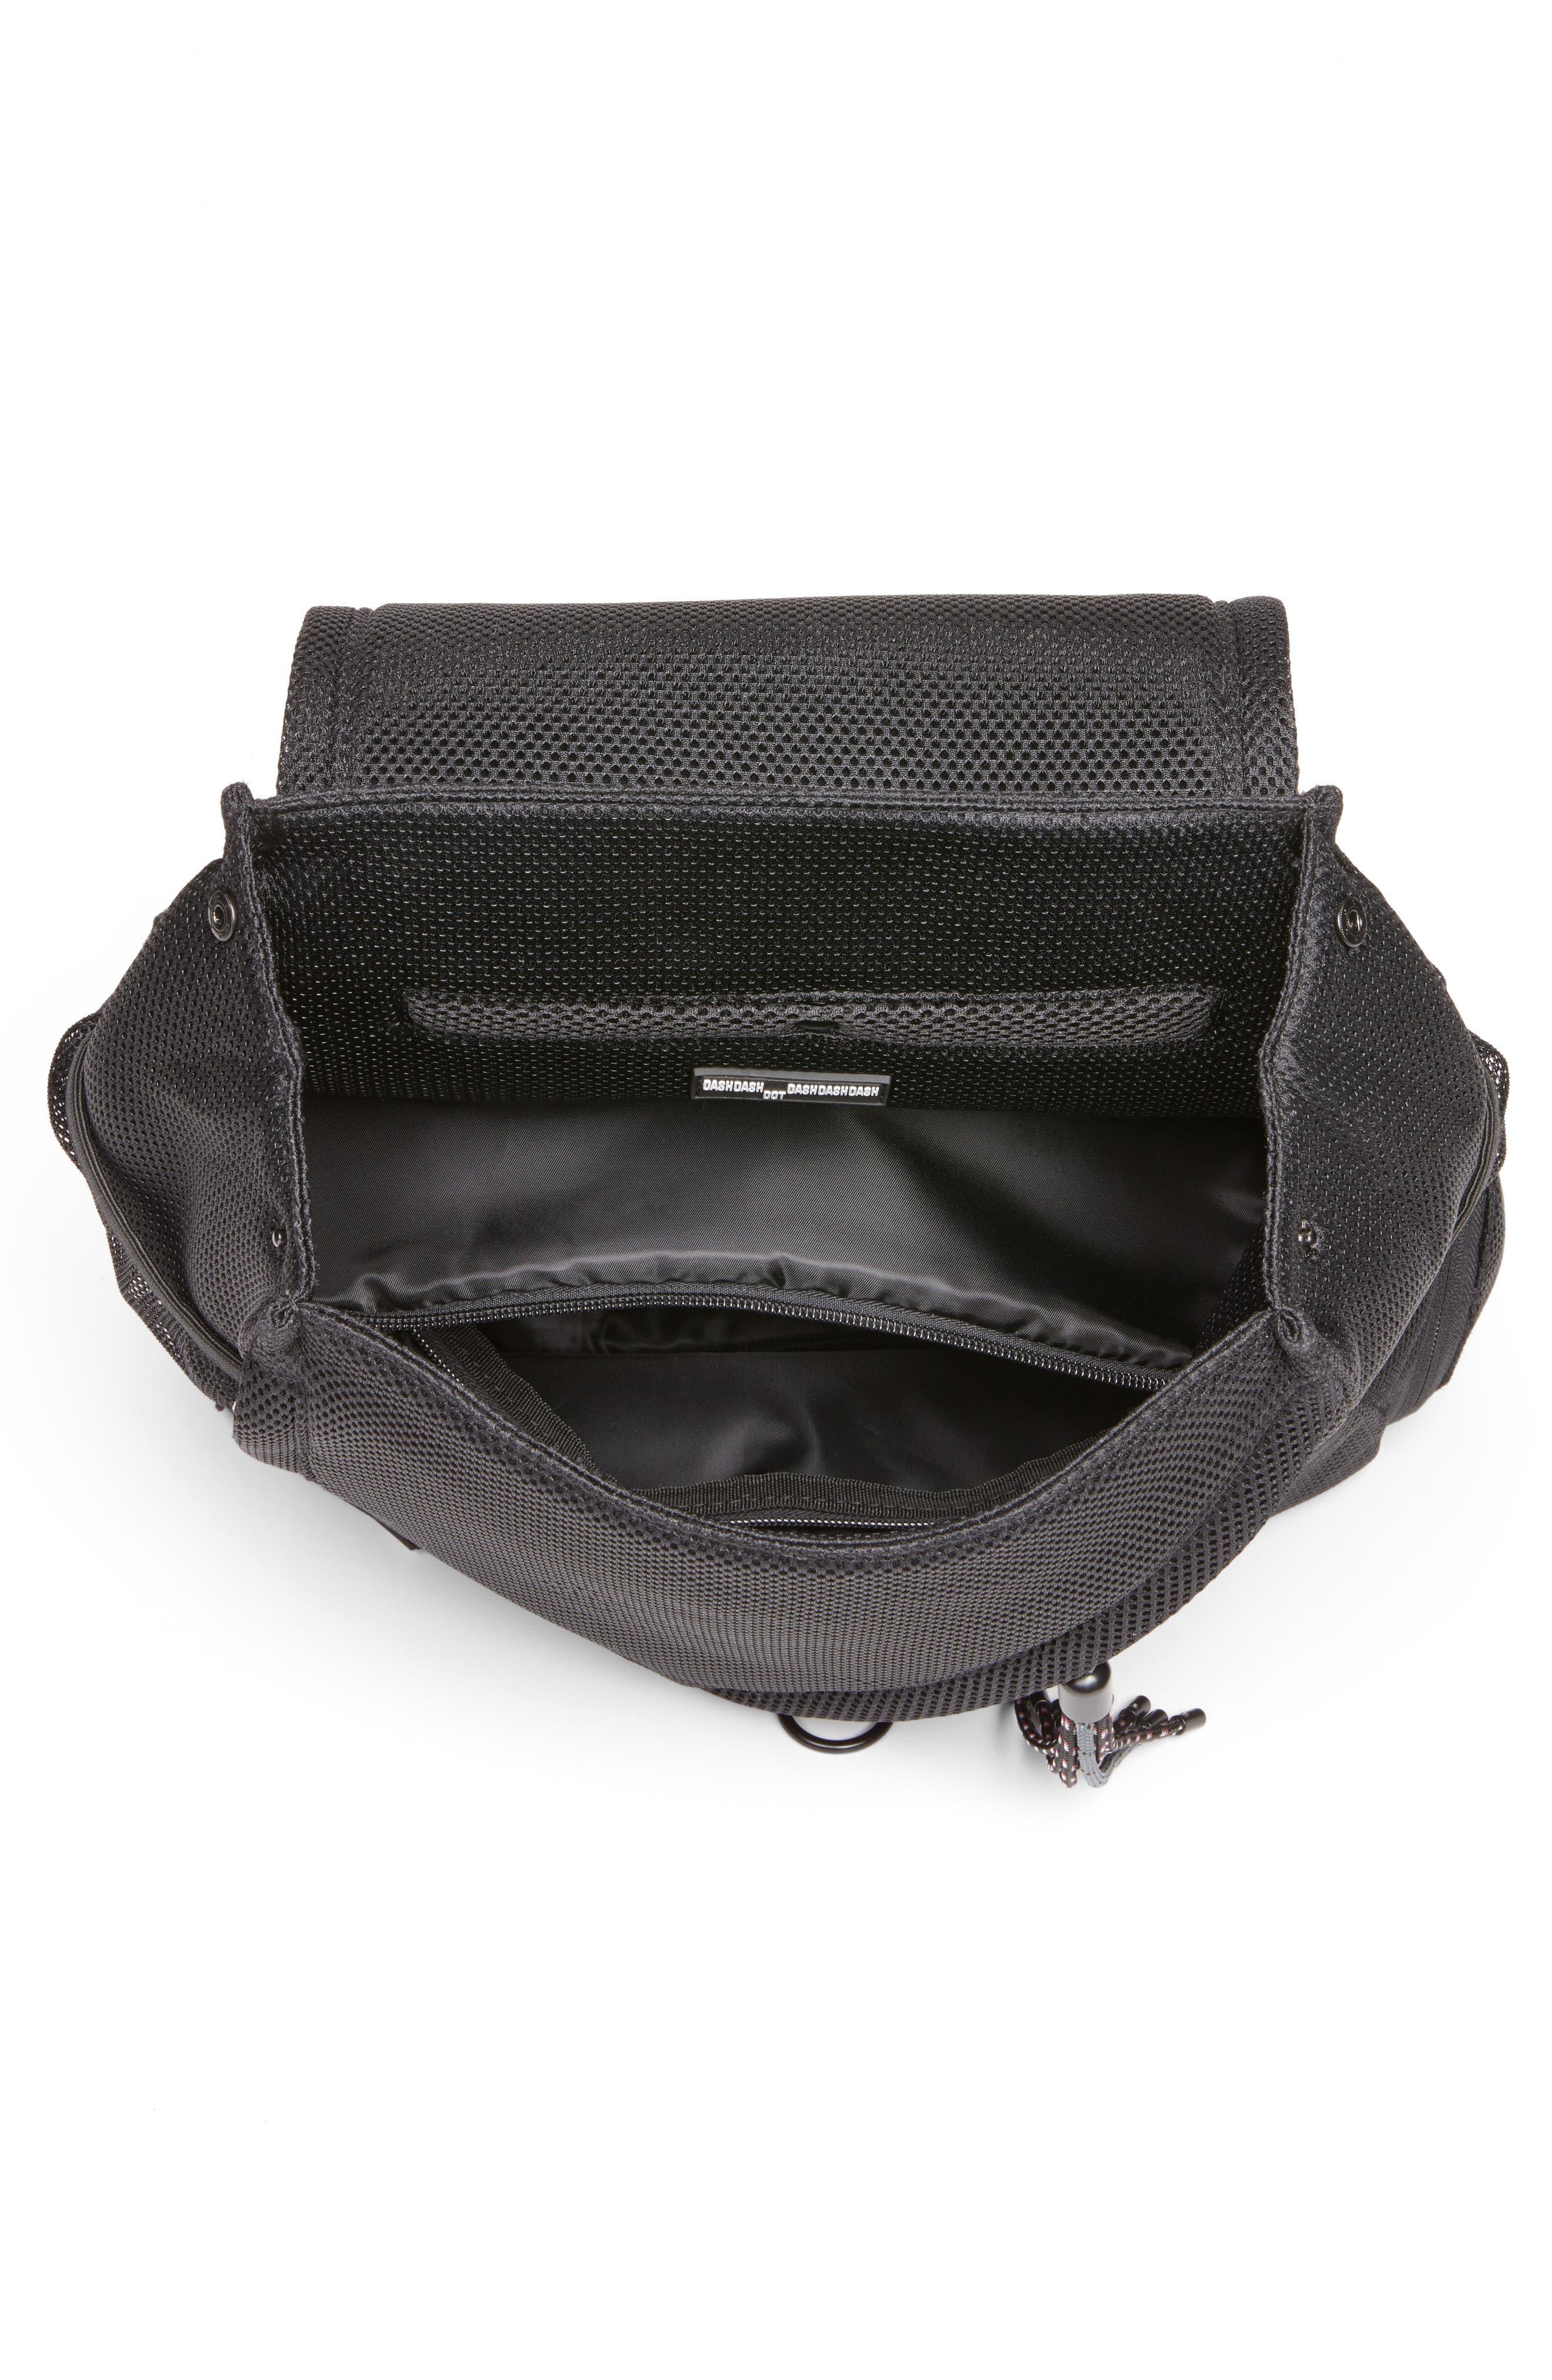 Water Resistant Backpack,                             Alternate thumbnail 4, color,                             001